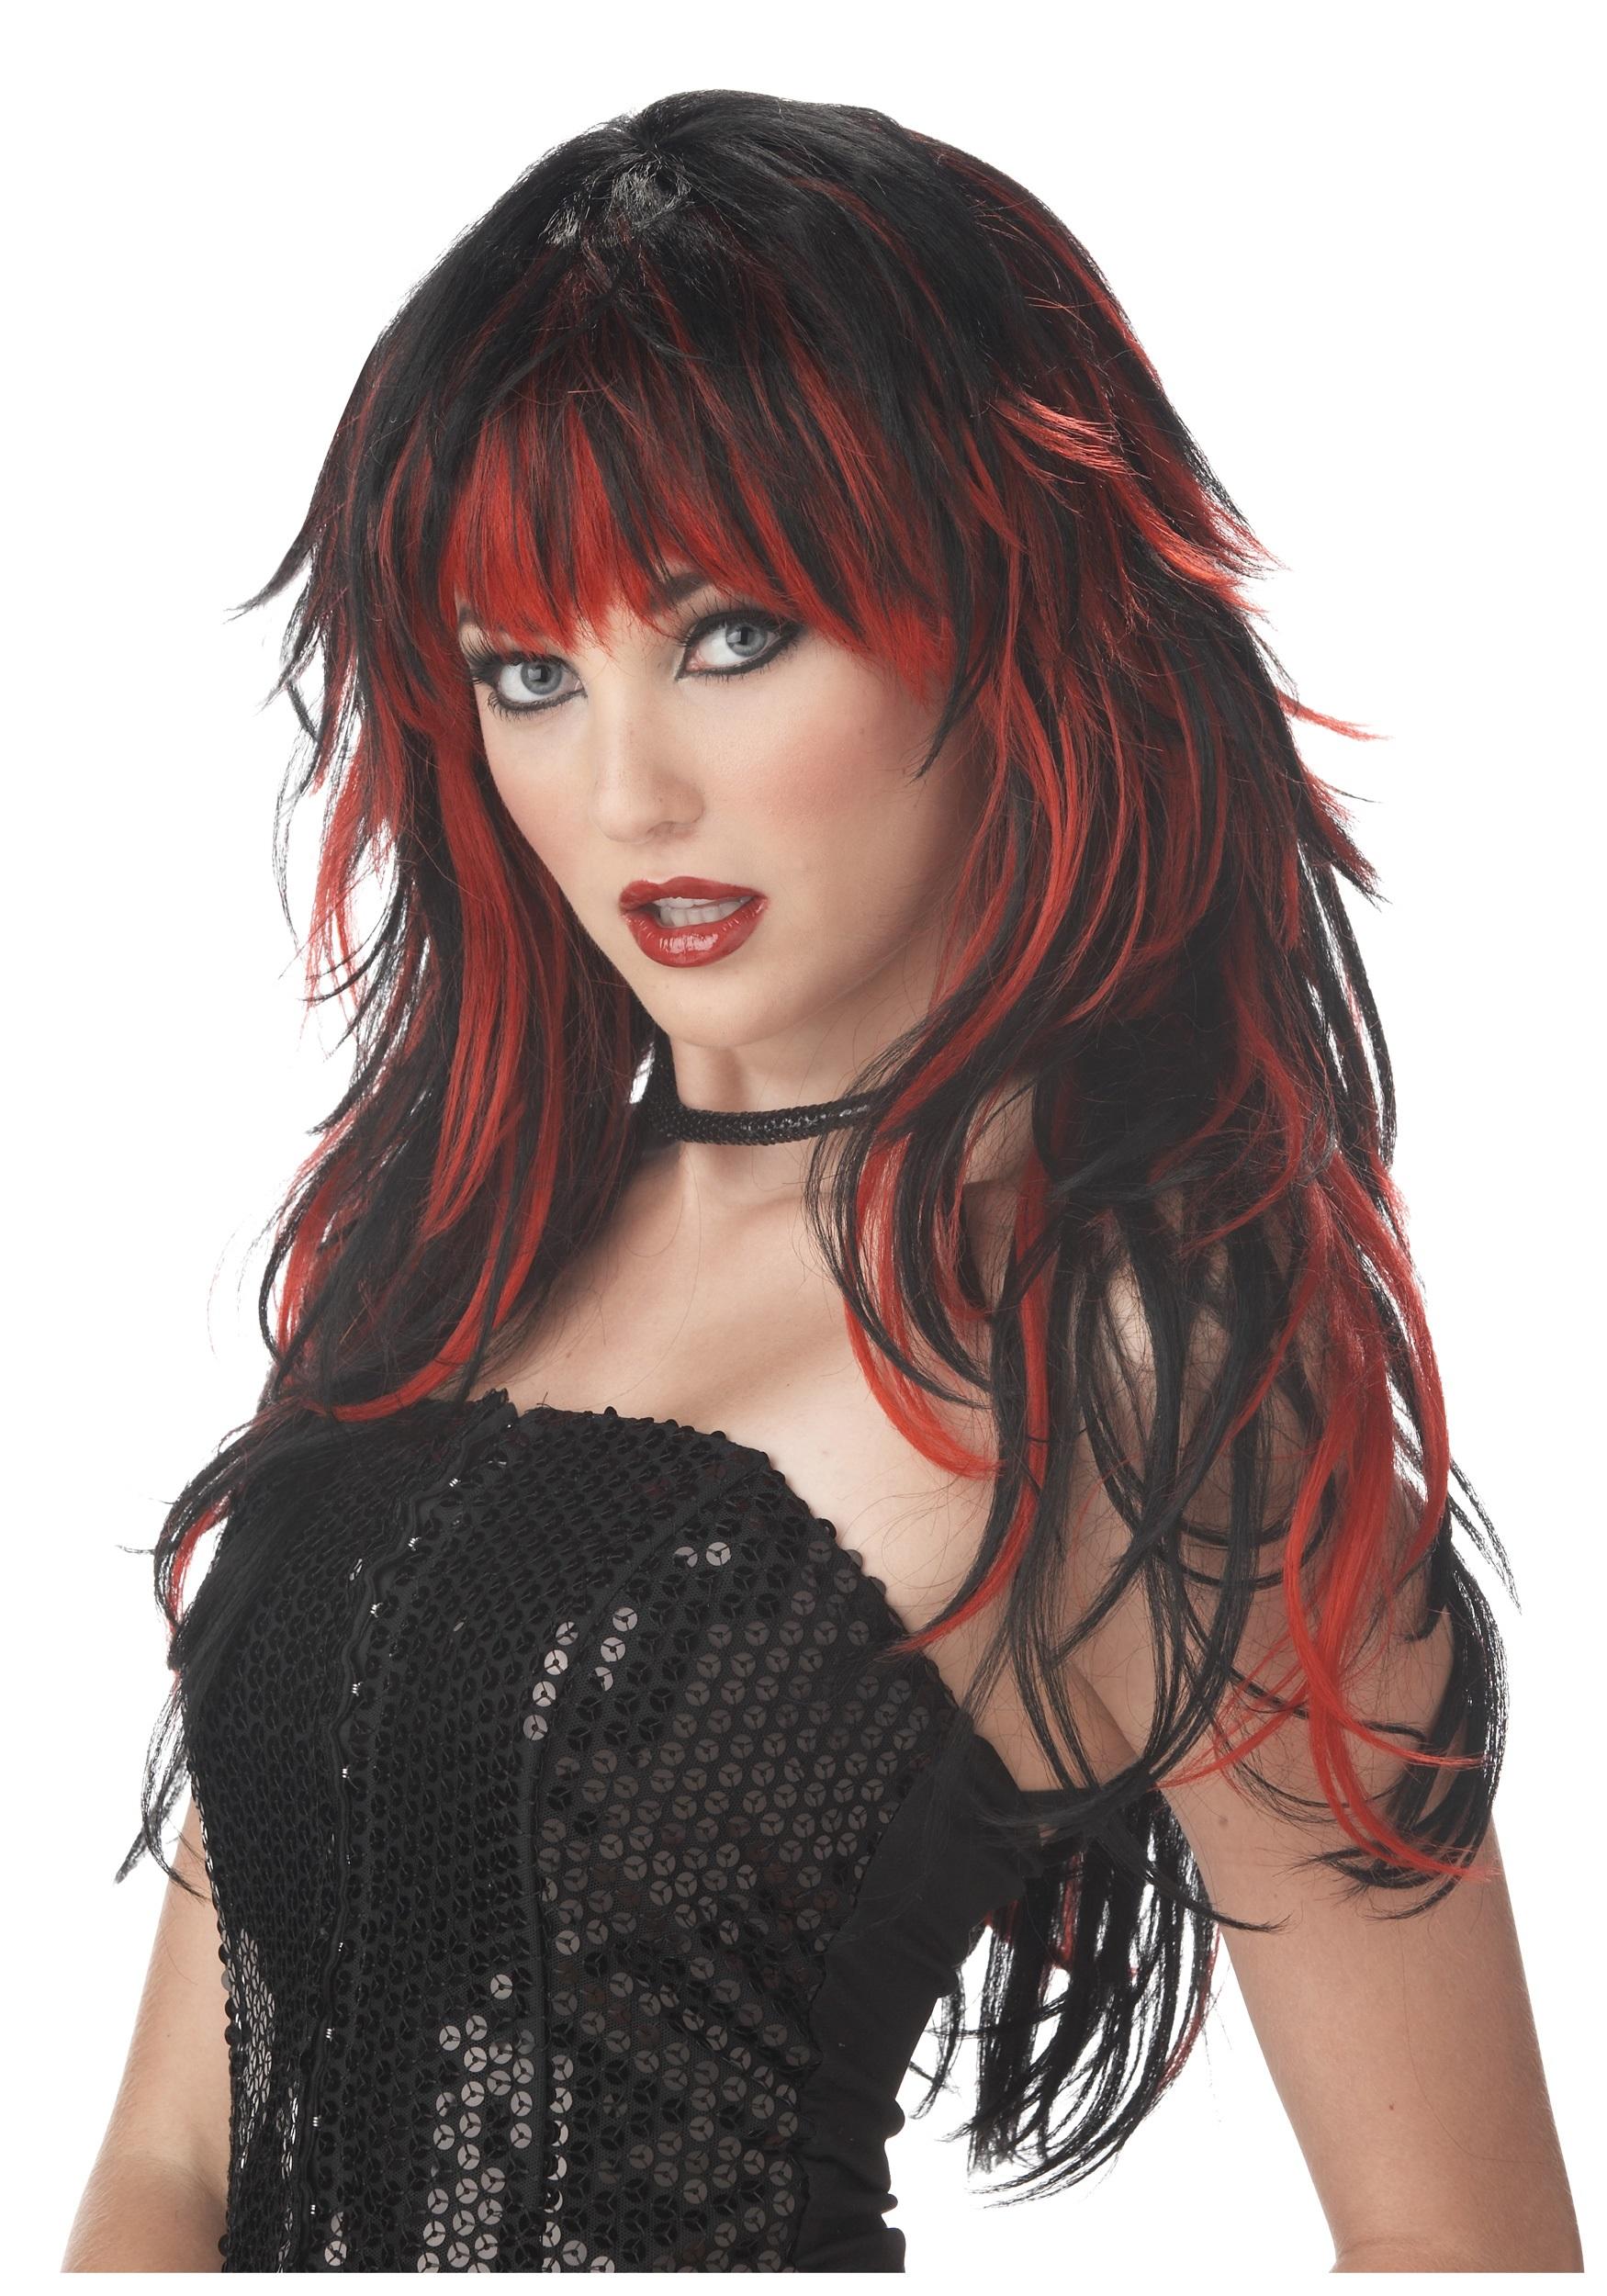 womens-vampire-wig.jpg d1c1e4324c